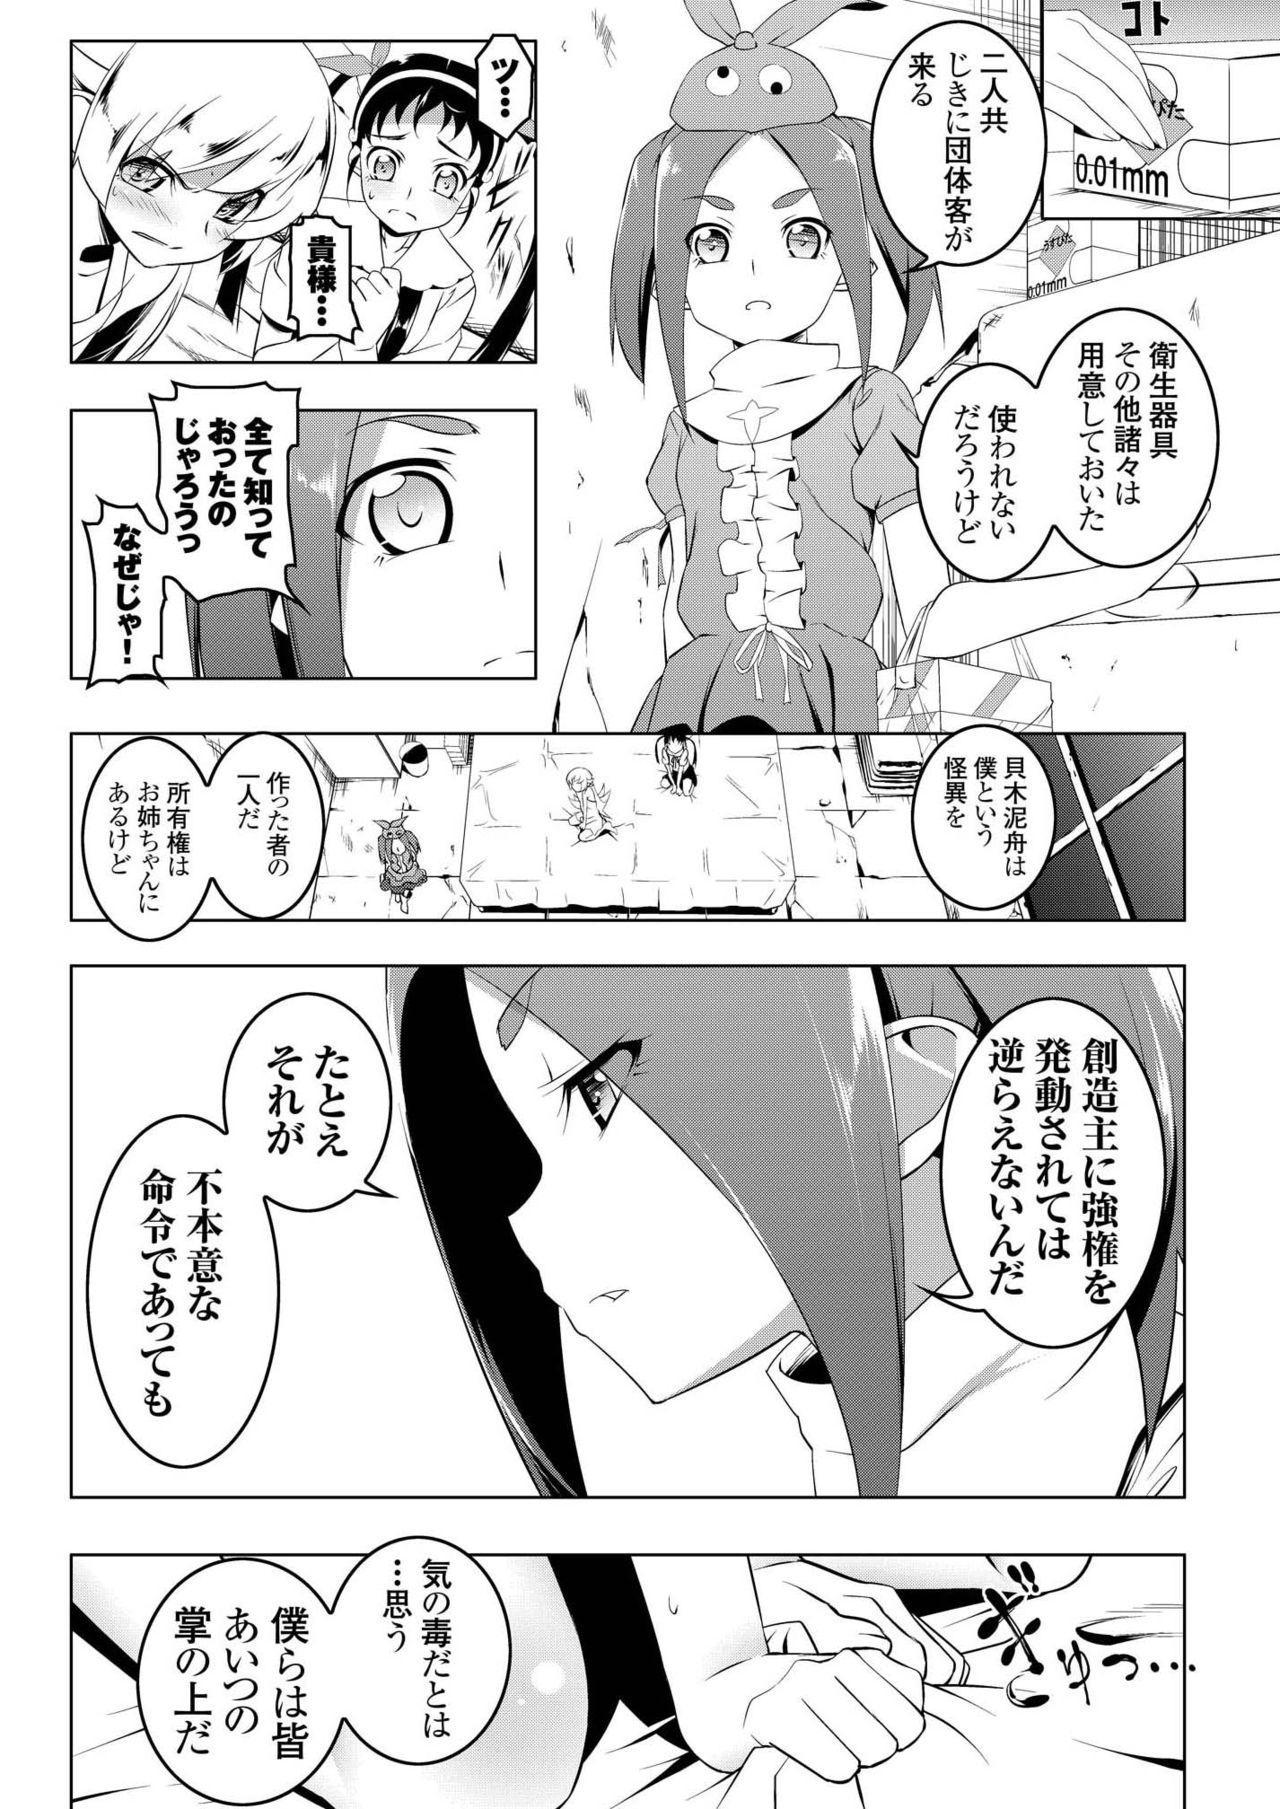 Netoraregatari Soushuuhen Ni 5